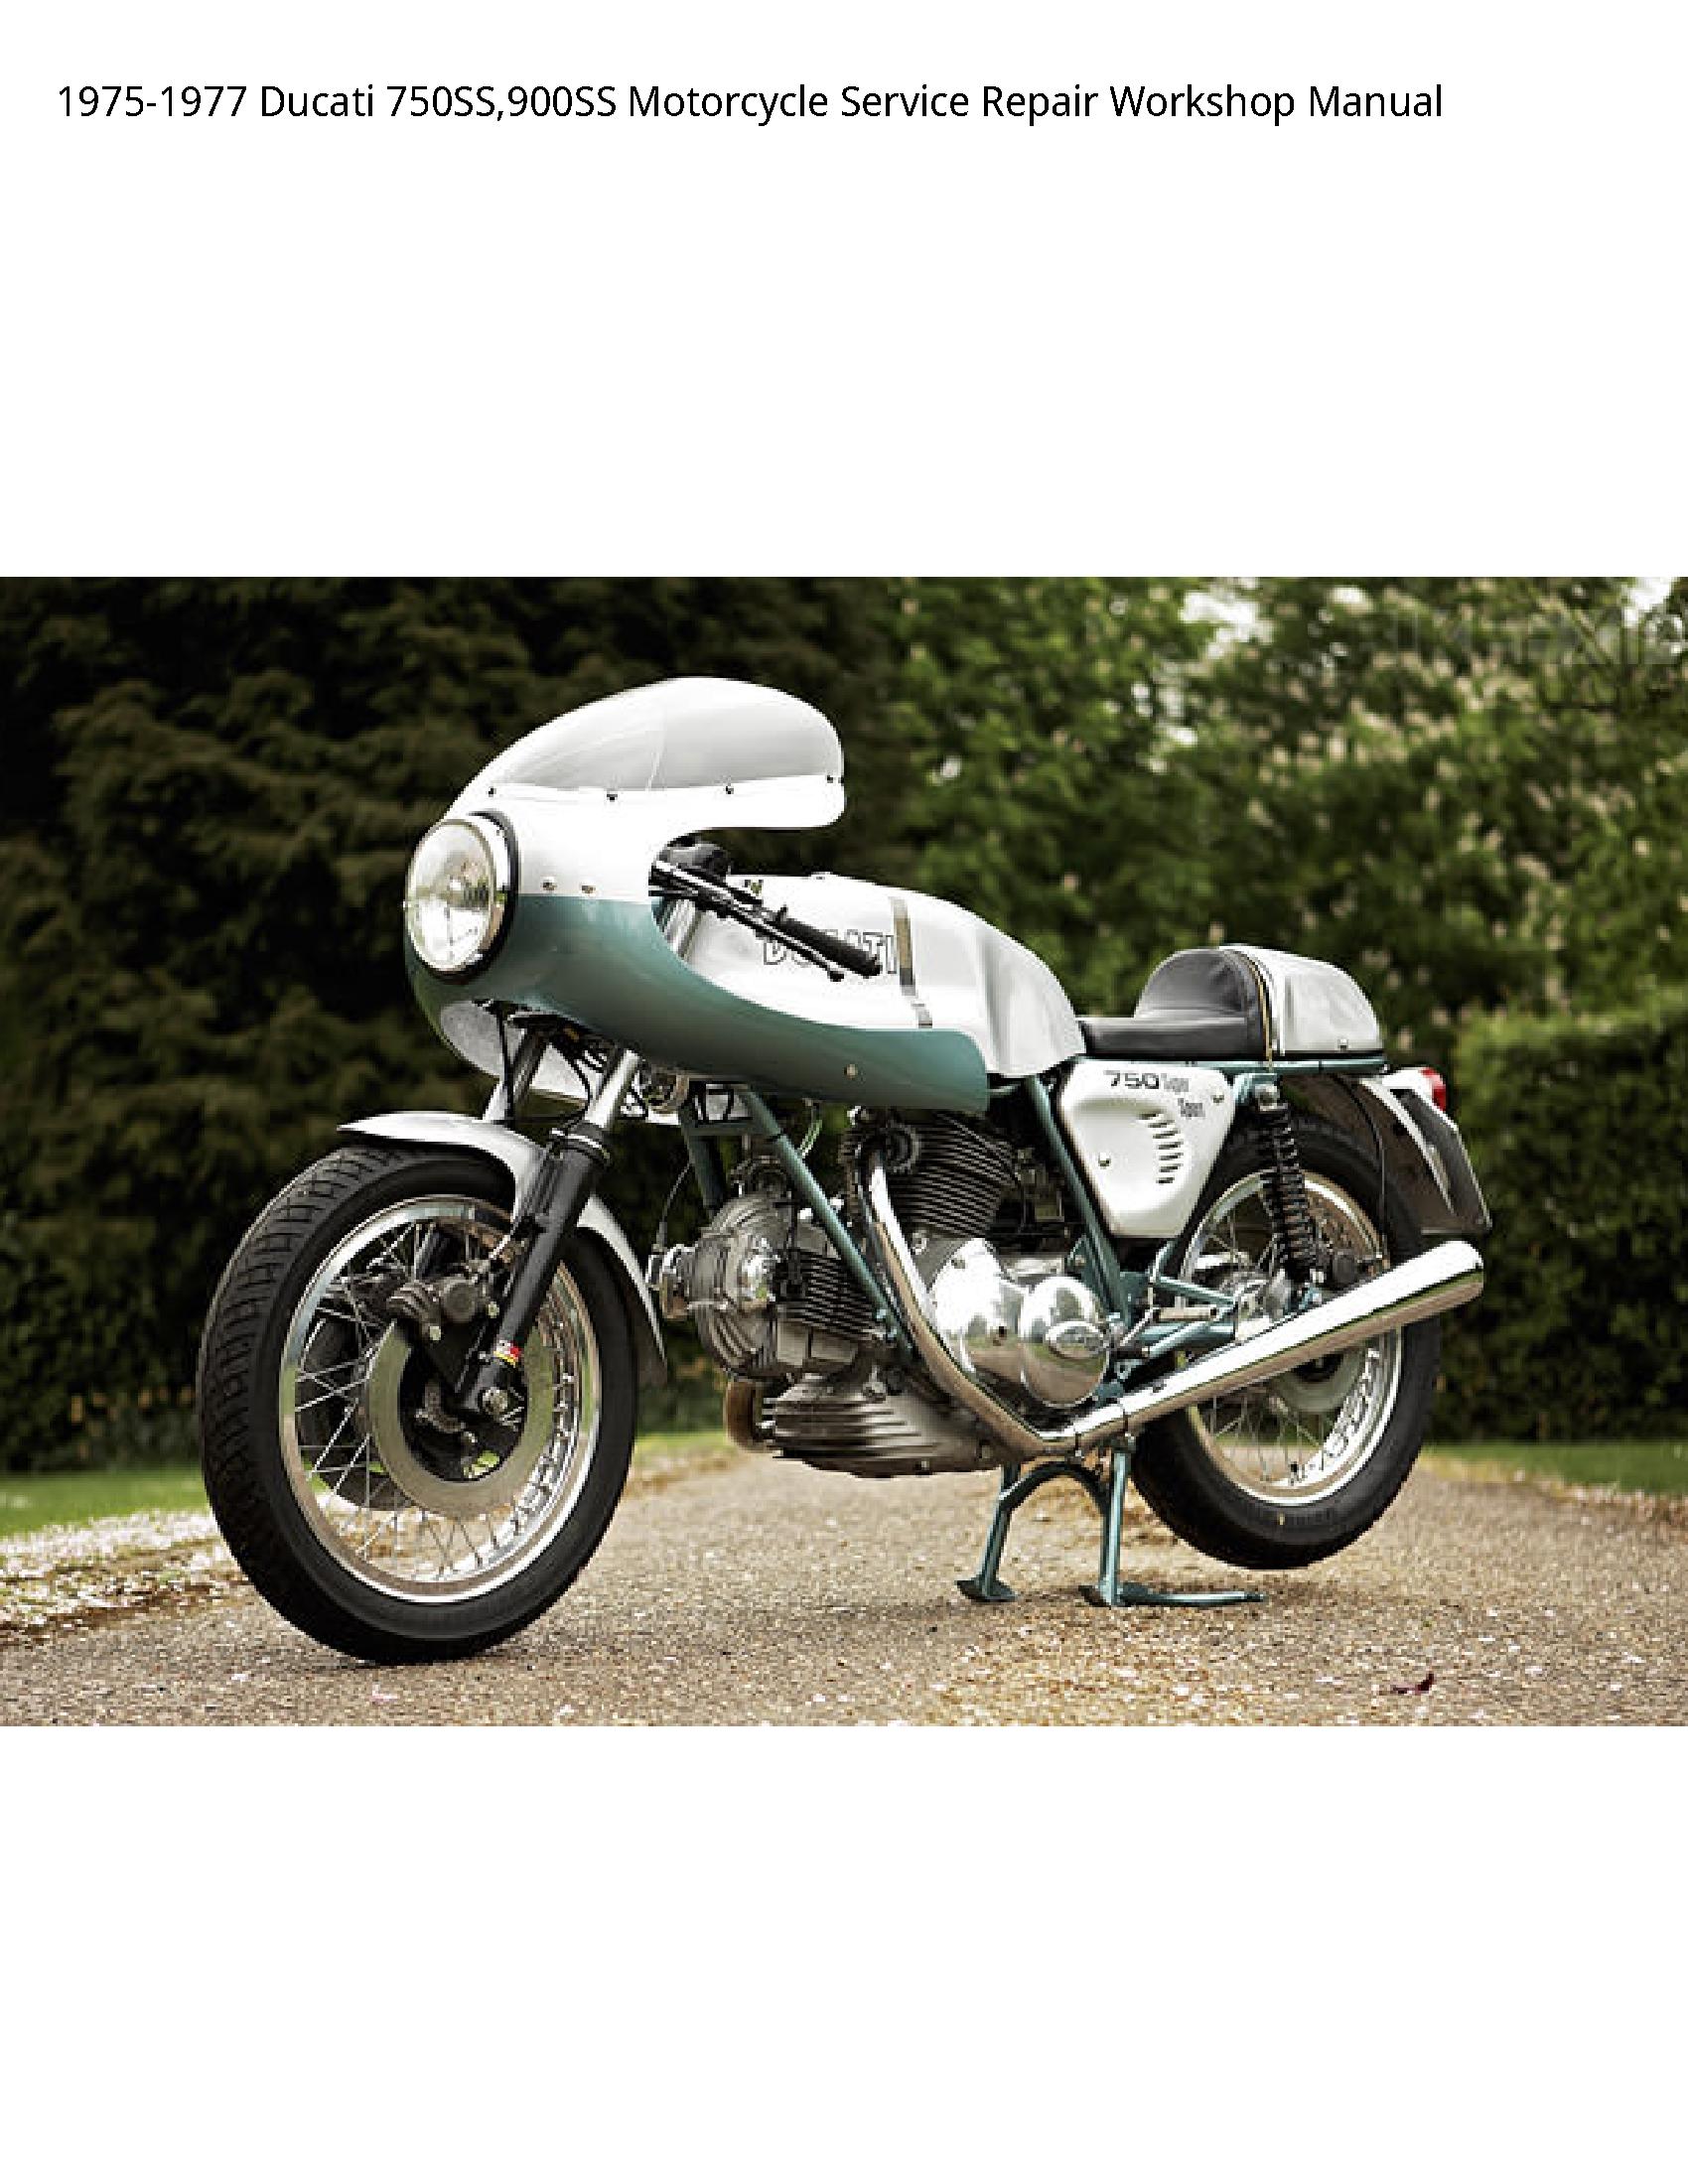 Ducati 750SS Motorcycle manual